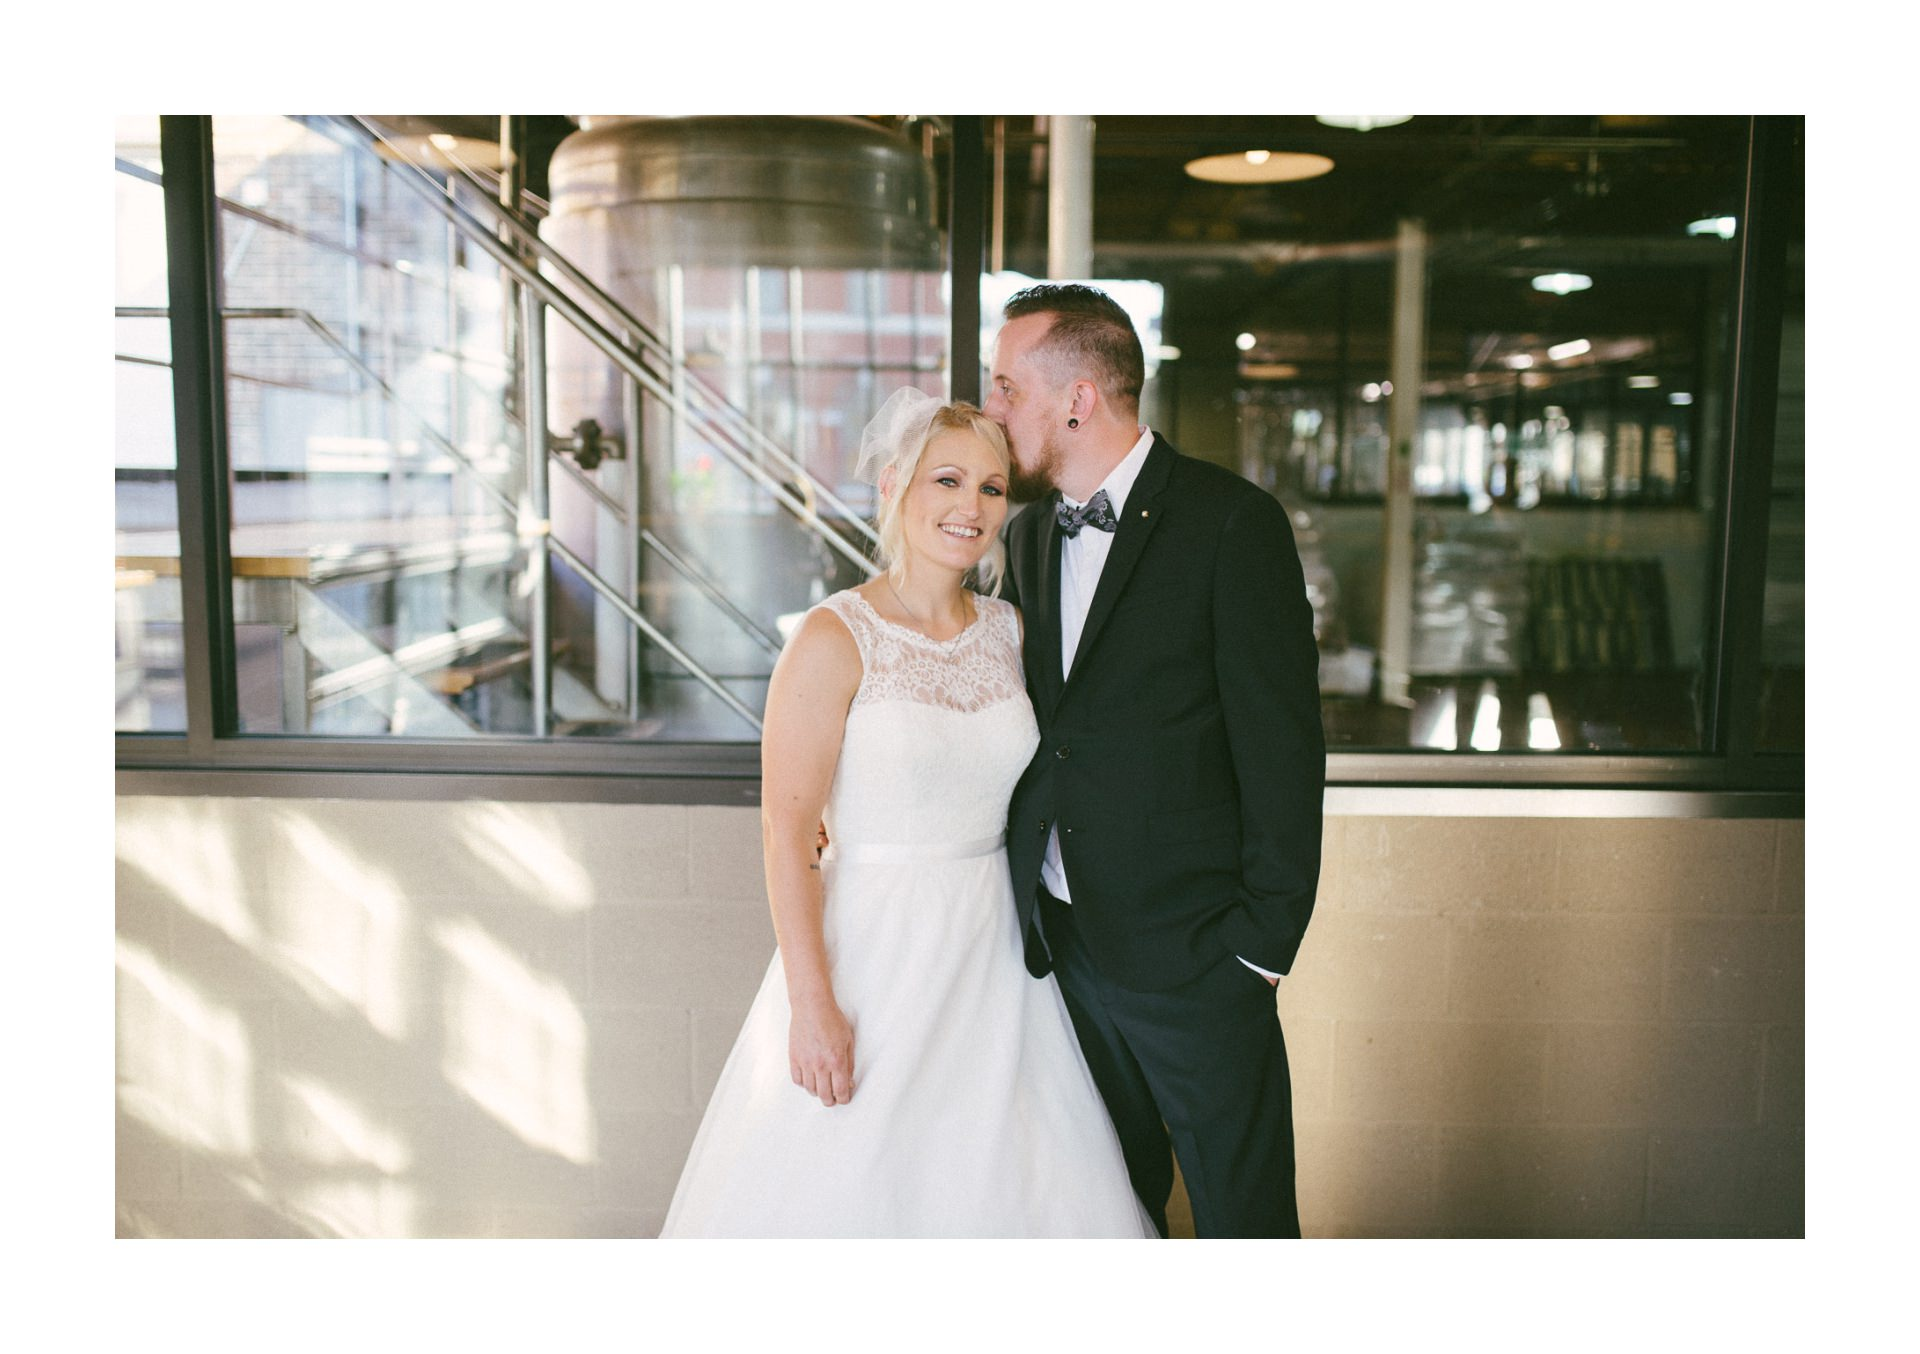 Goldhorn Brewery Wedding Photos in Cleveland 2 25.jpg